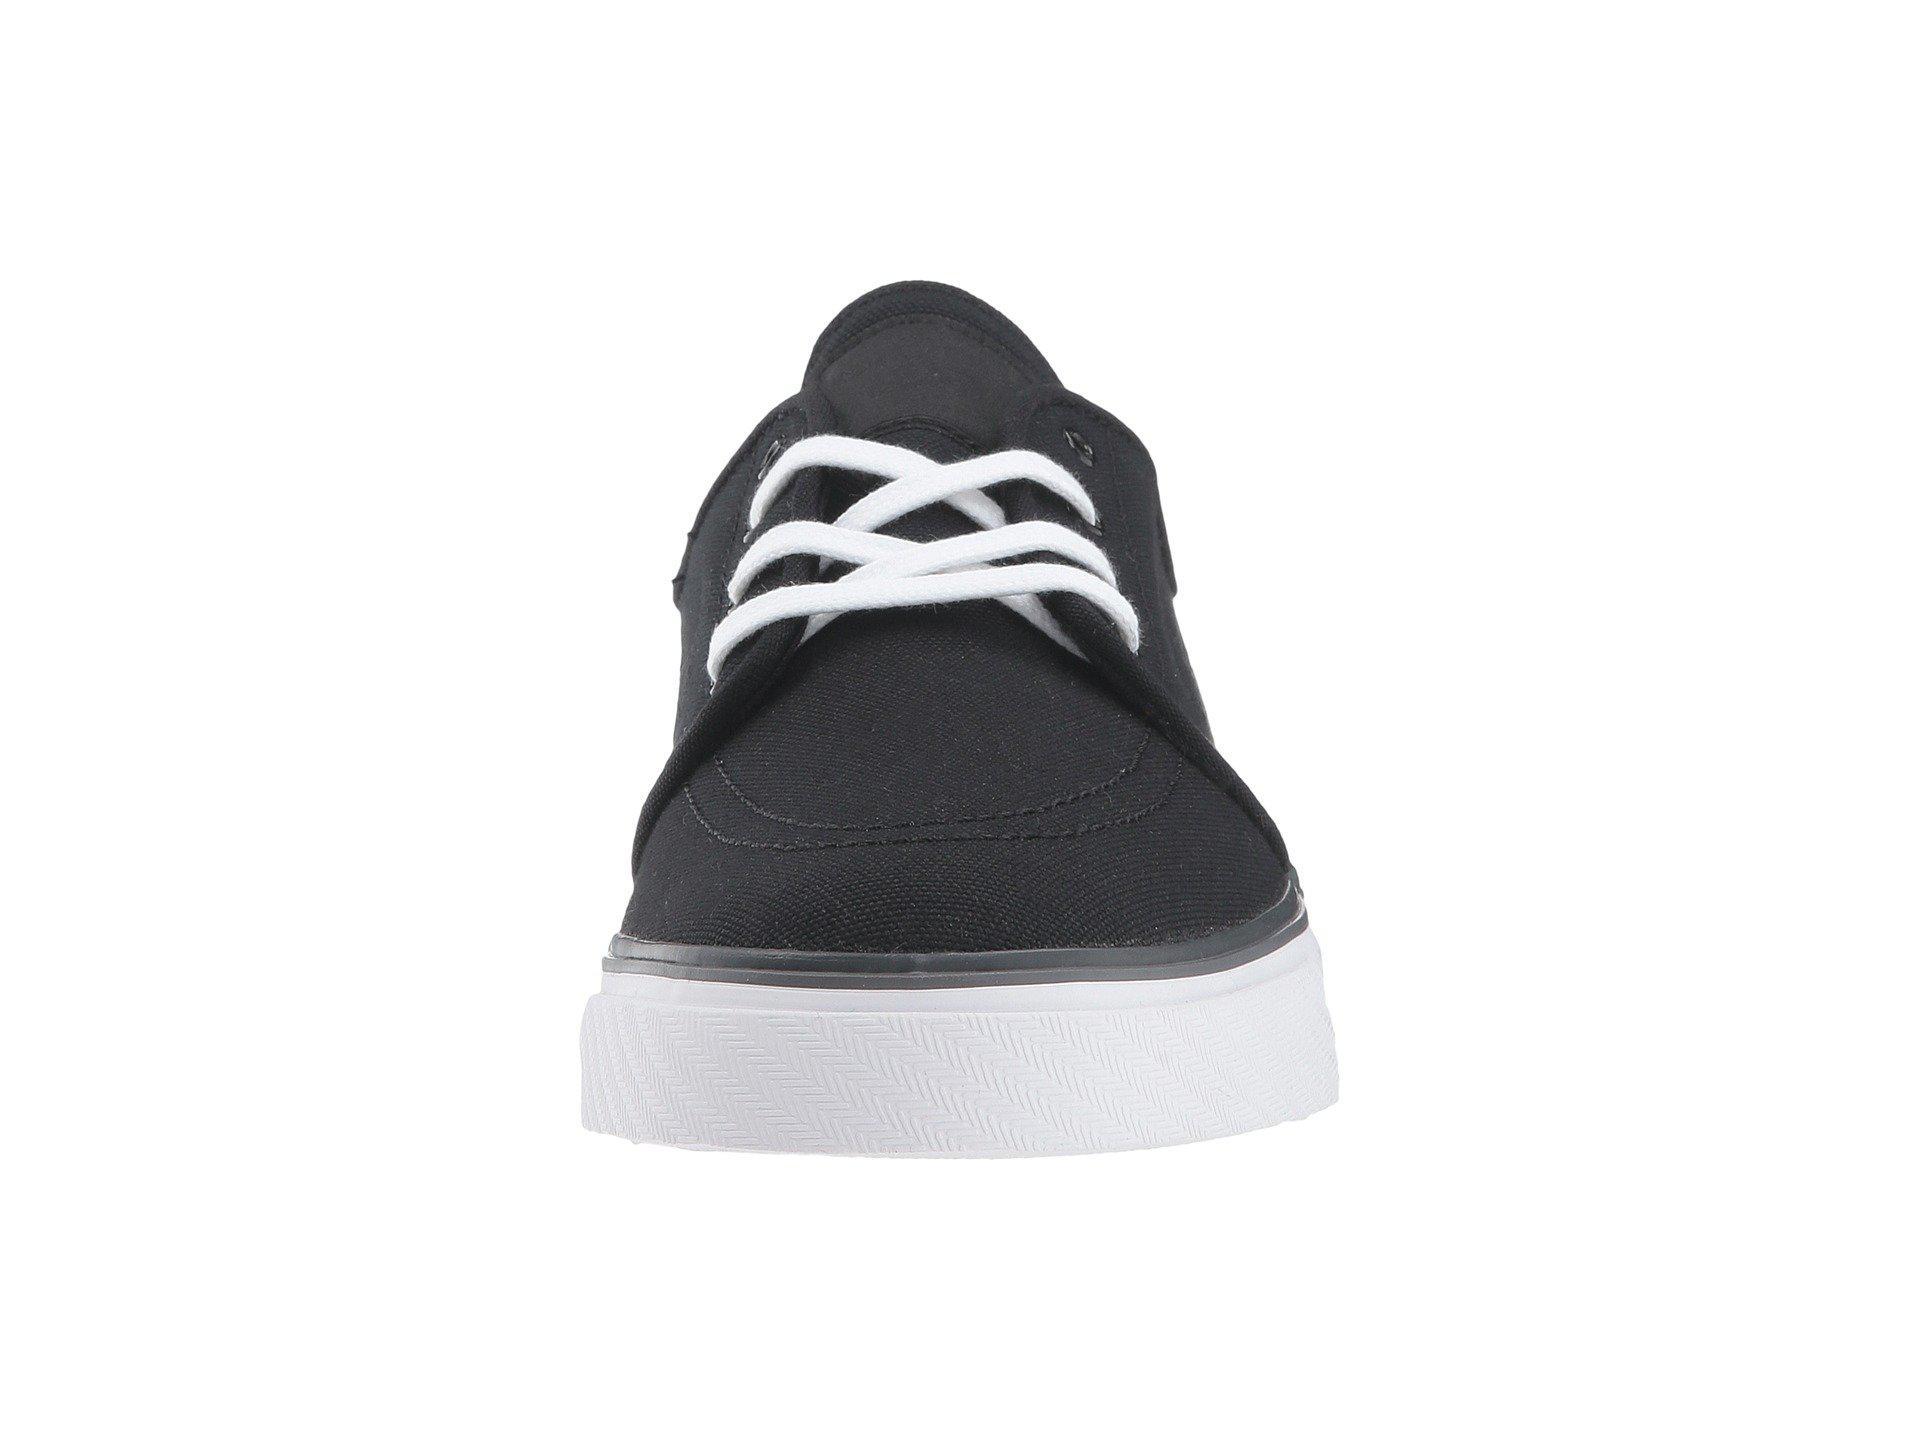 pretty nice 5bf34 bcaa3 Lyst - Nike Air Zoom Stefan Janoski Canvas (black black white ...